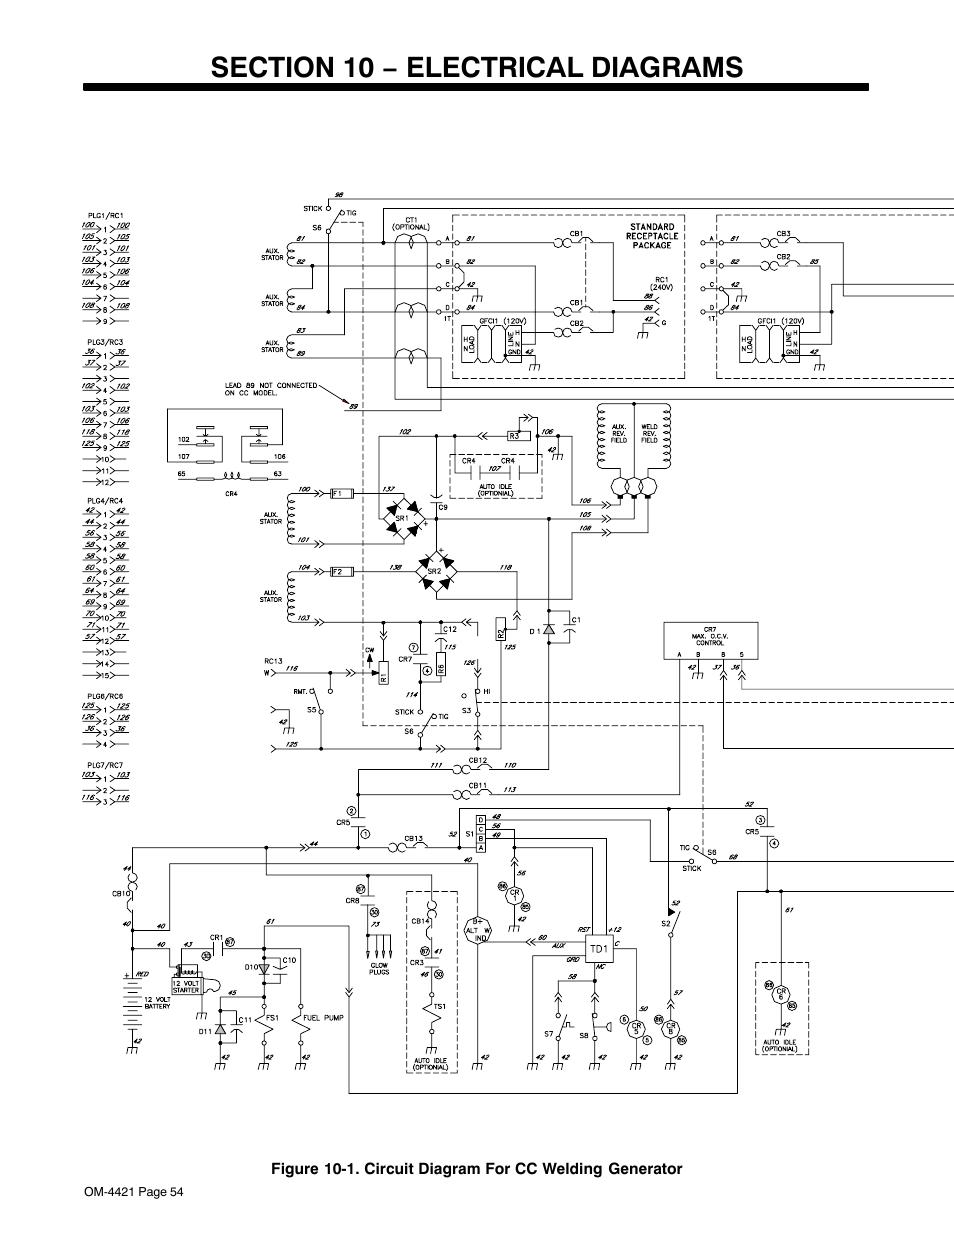 Miller S52e Wiring Diagram